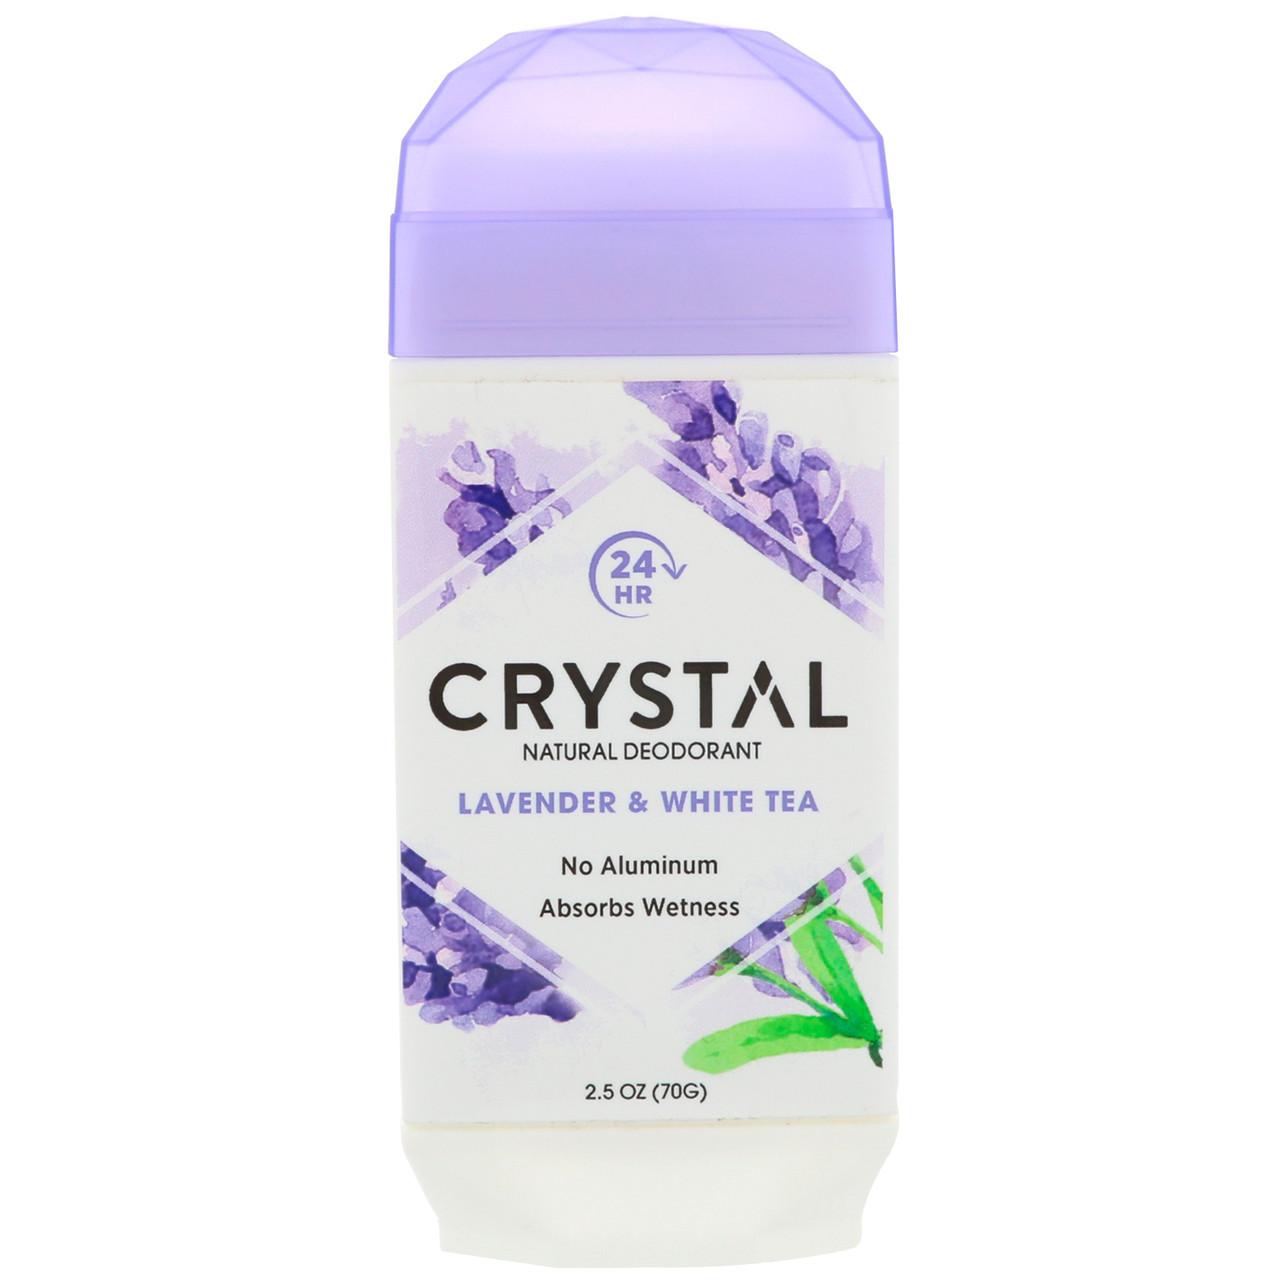 Натуральный дезодорант, лаванда и белый чай, Crystal Body Deodorant, 70 г